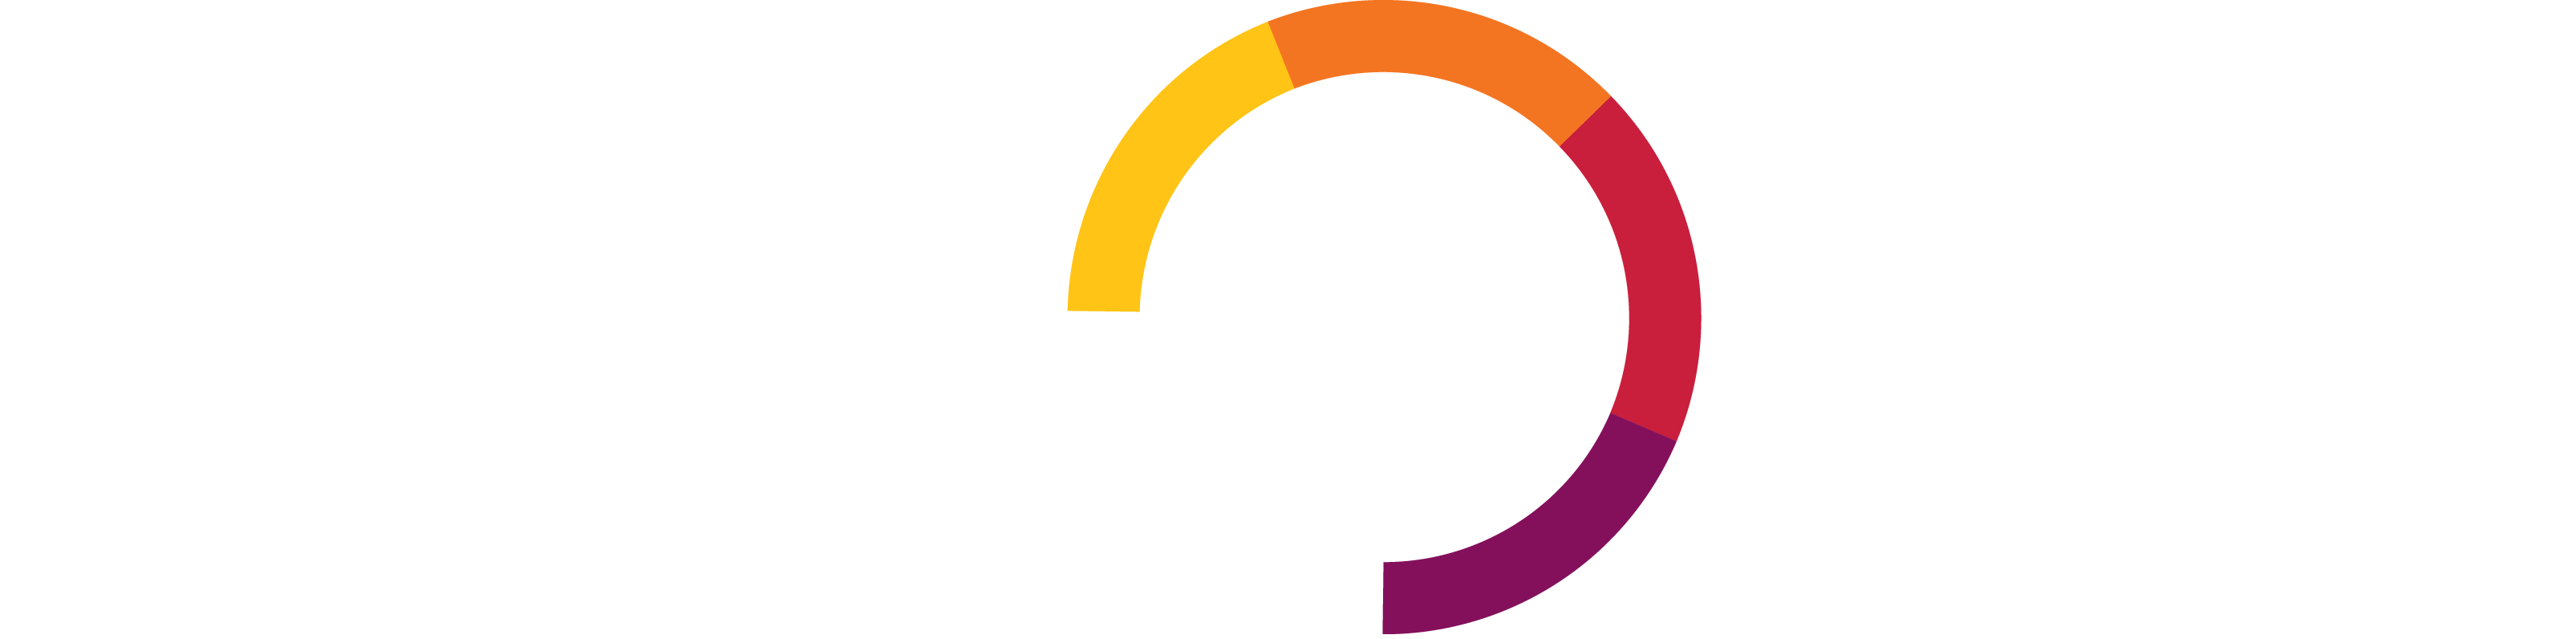 Oravská raketa